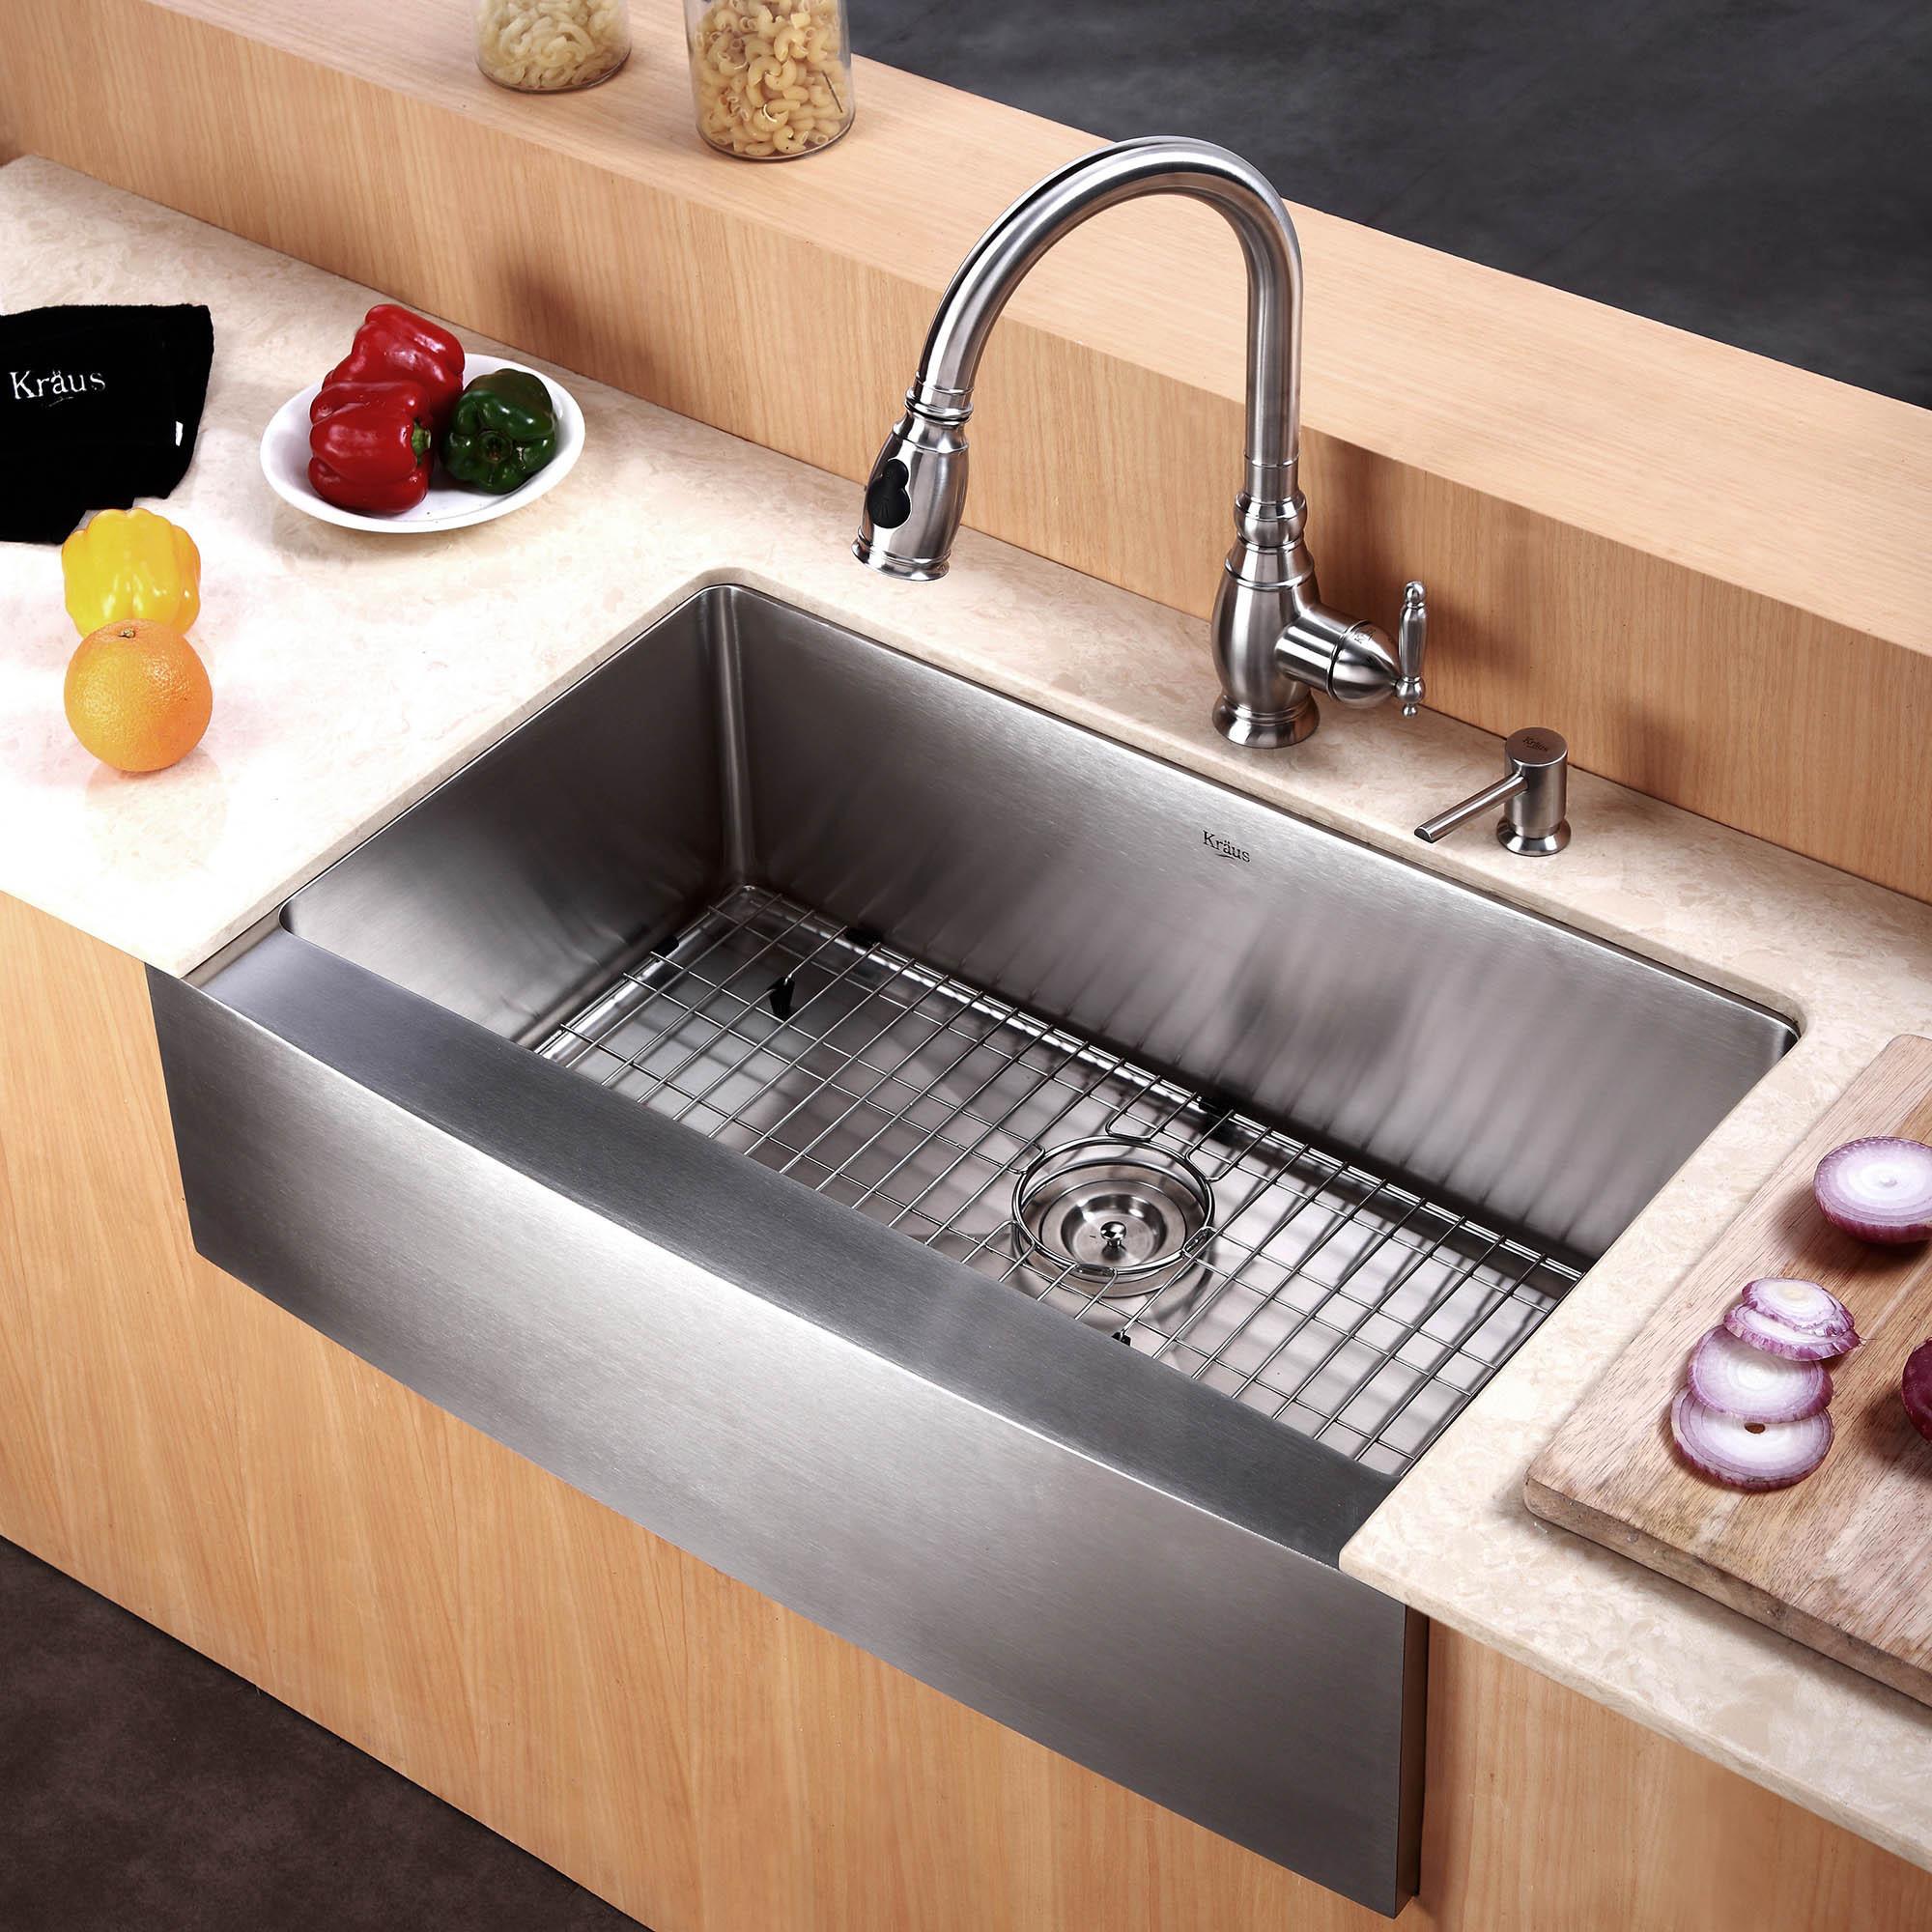 Kraus Khf200 30 Farmhouse Inch 1 Bowl Stainless Steel Kitchen Sink